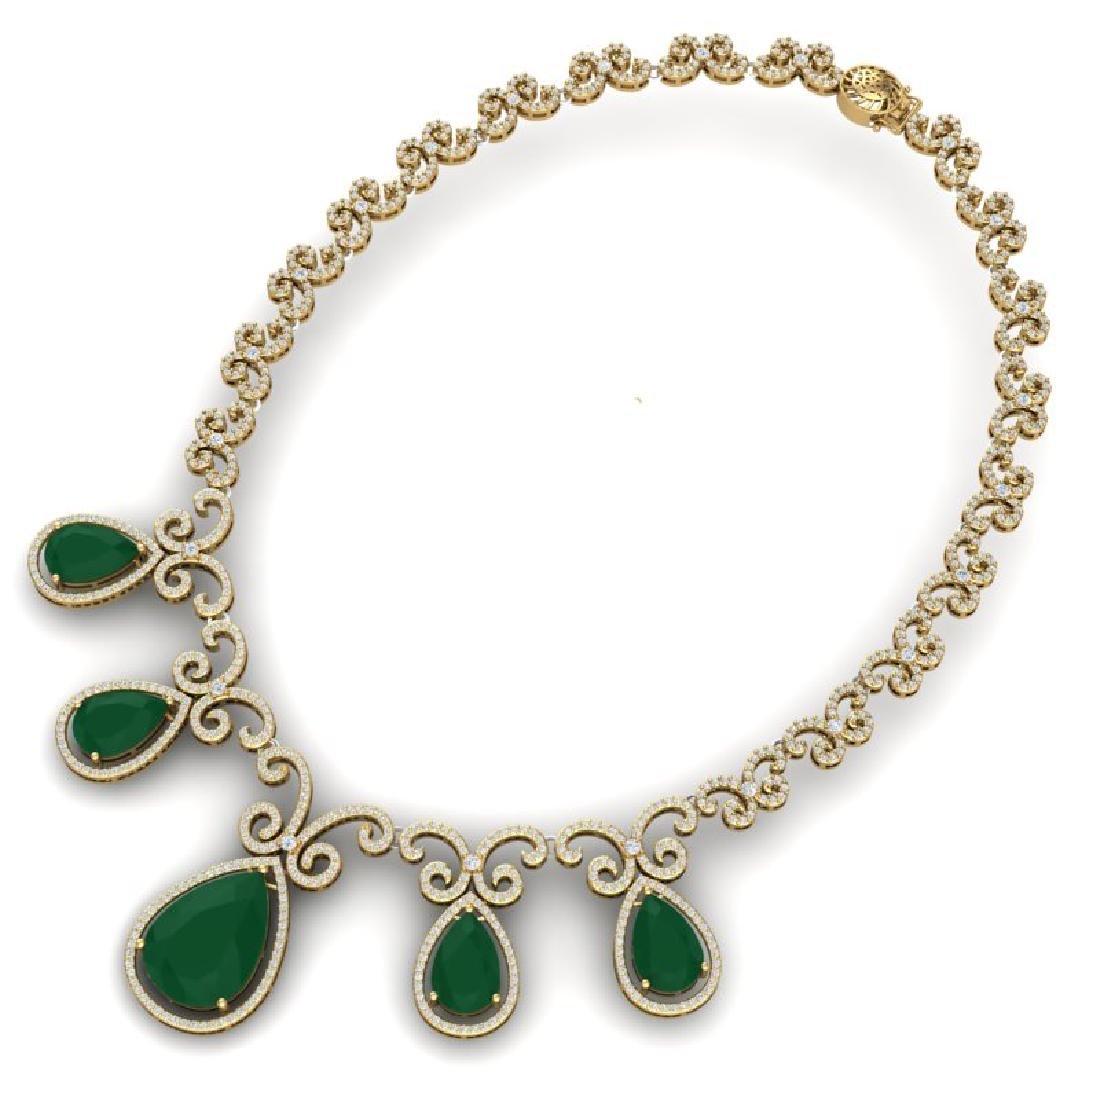 38.42 CTW Royalty Emerald & VS Diamond Necklace 18K - 3